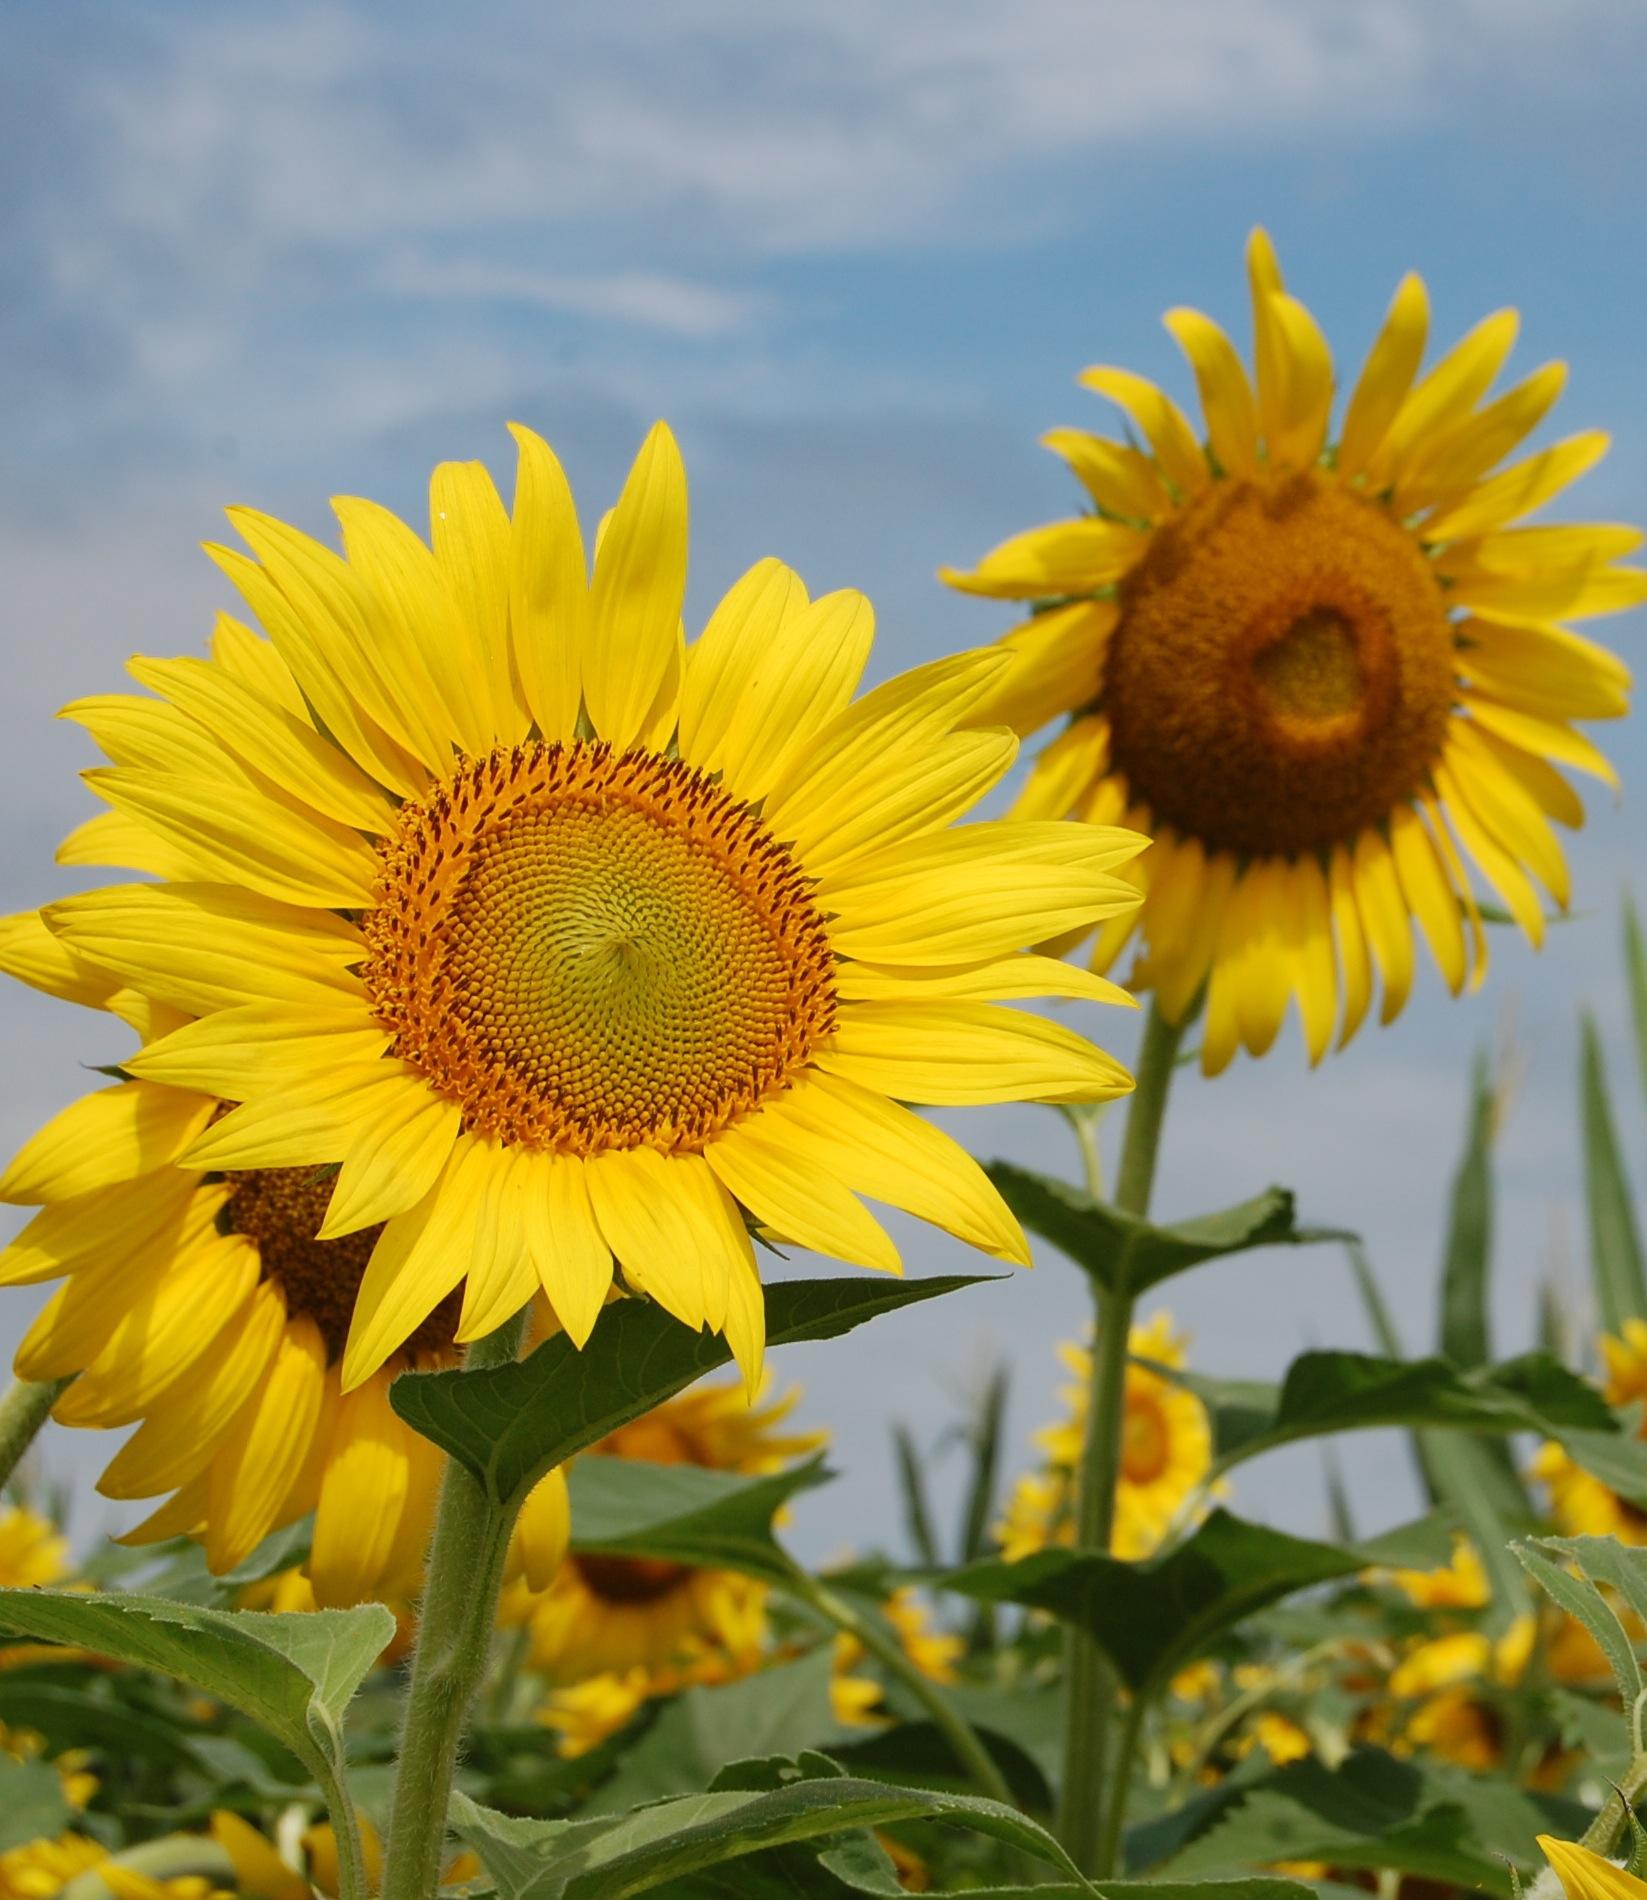 Homemade Sunflower Decor And Navy Decor For Kitchens